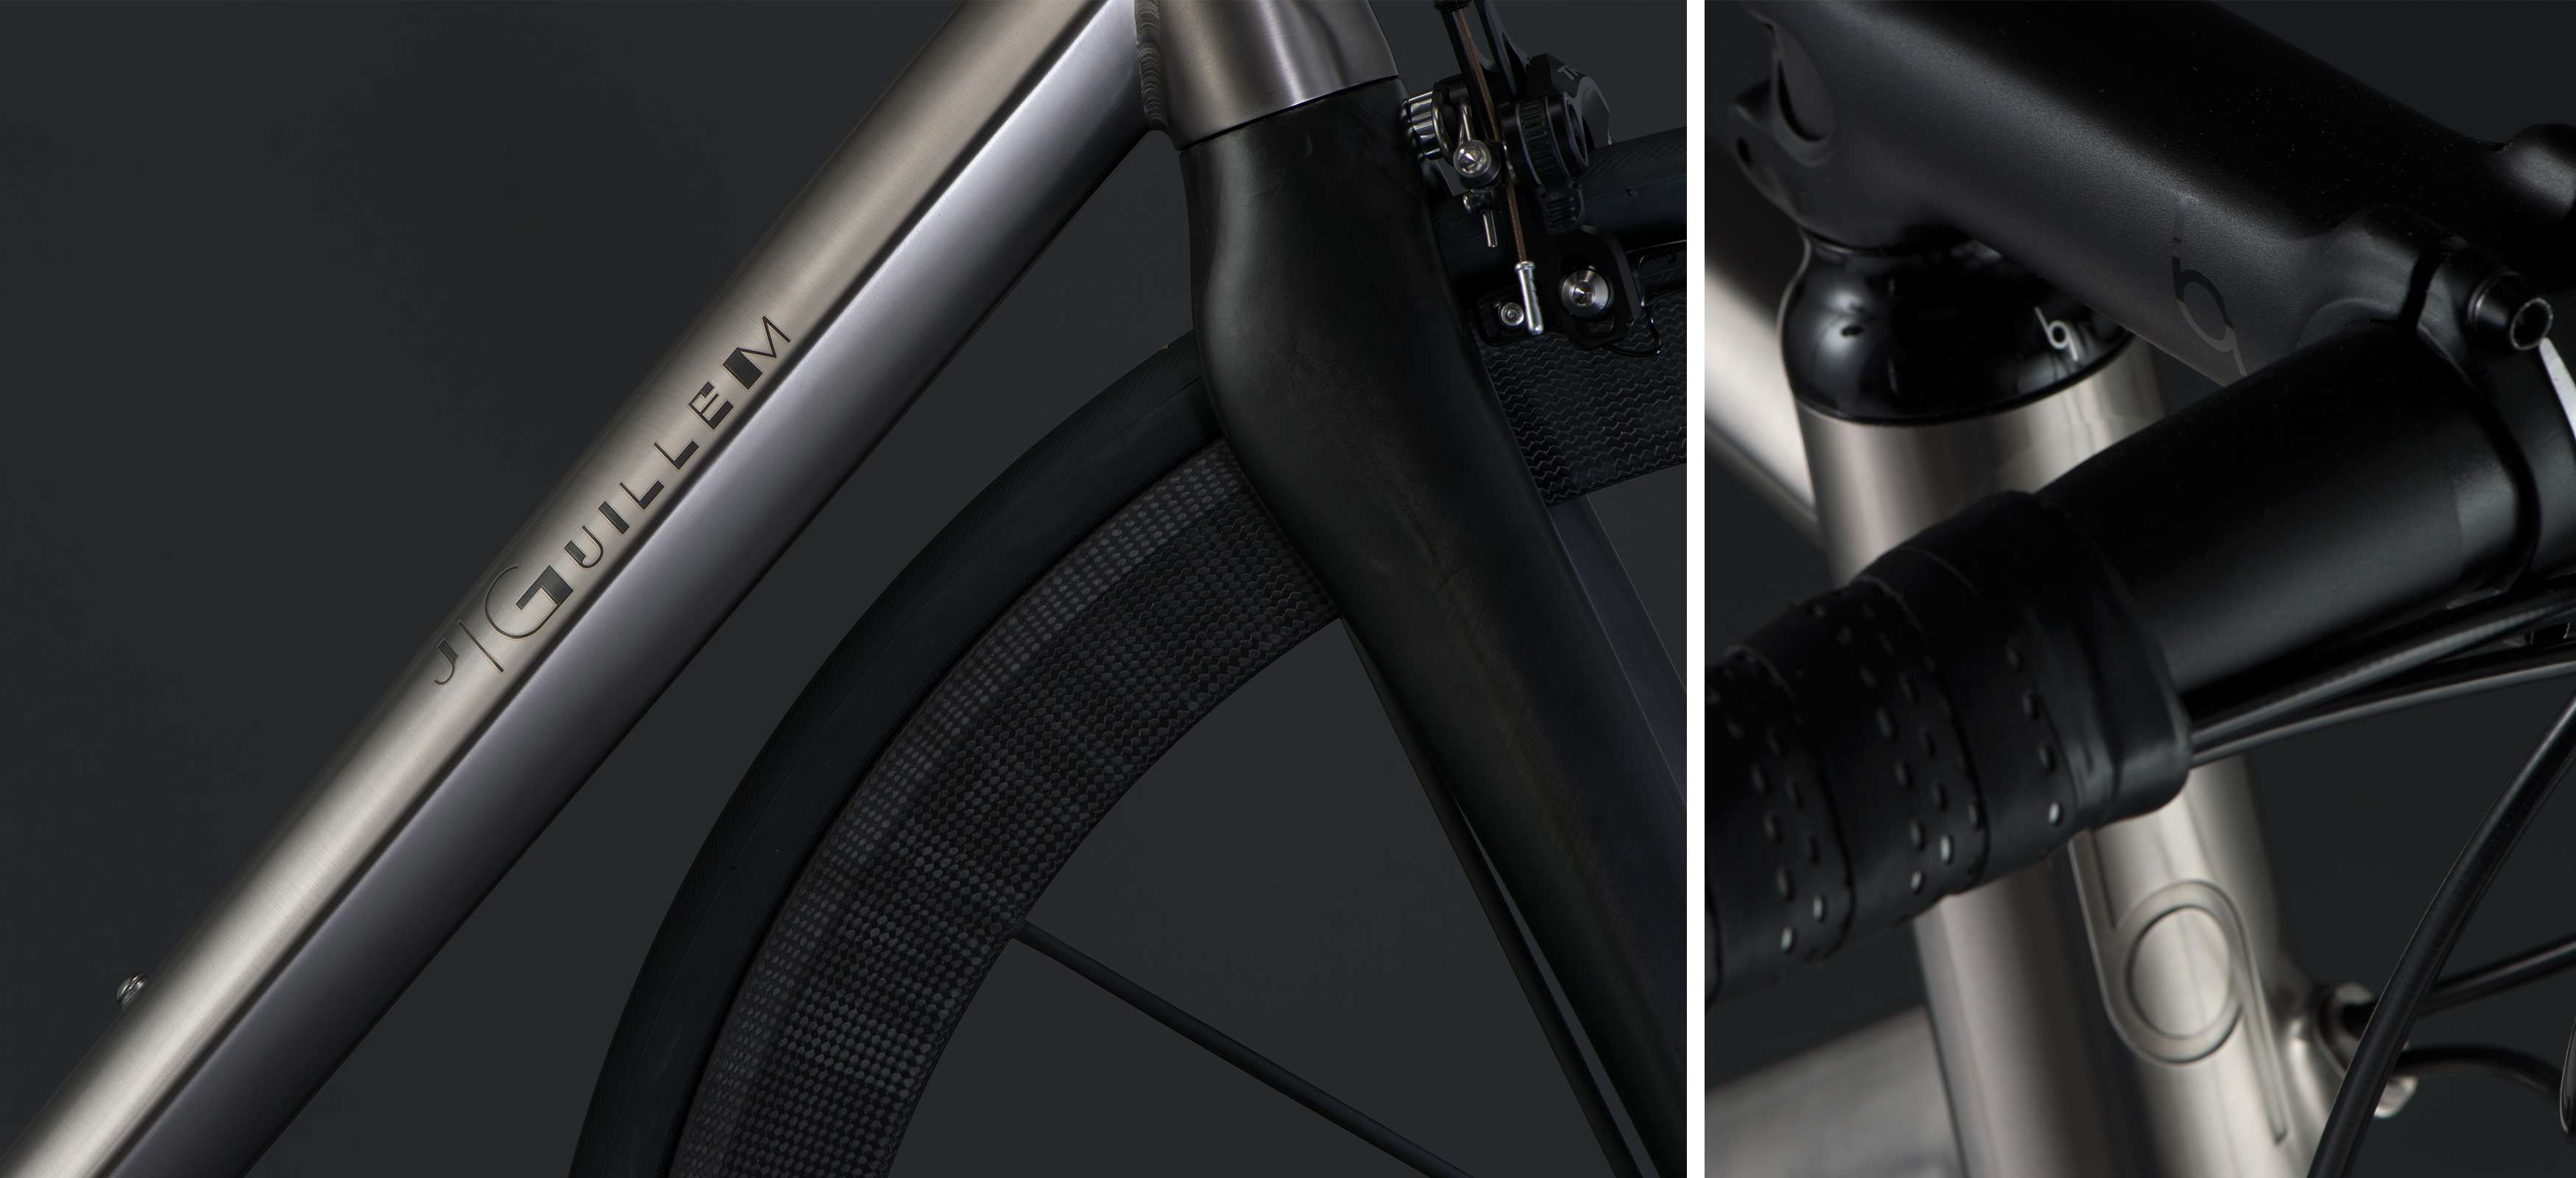 J.Guillem Titanium Bikes - Formentor